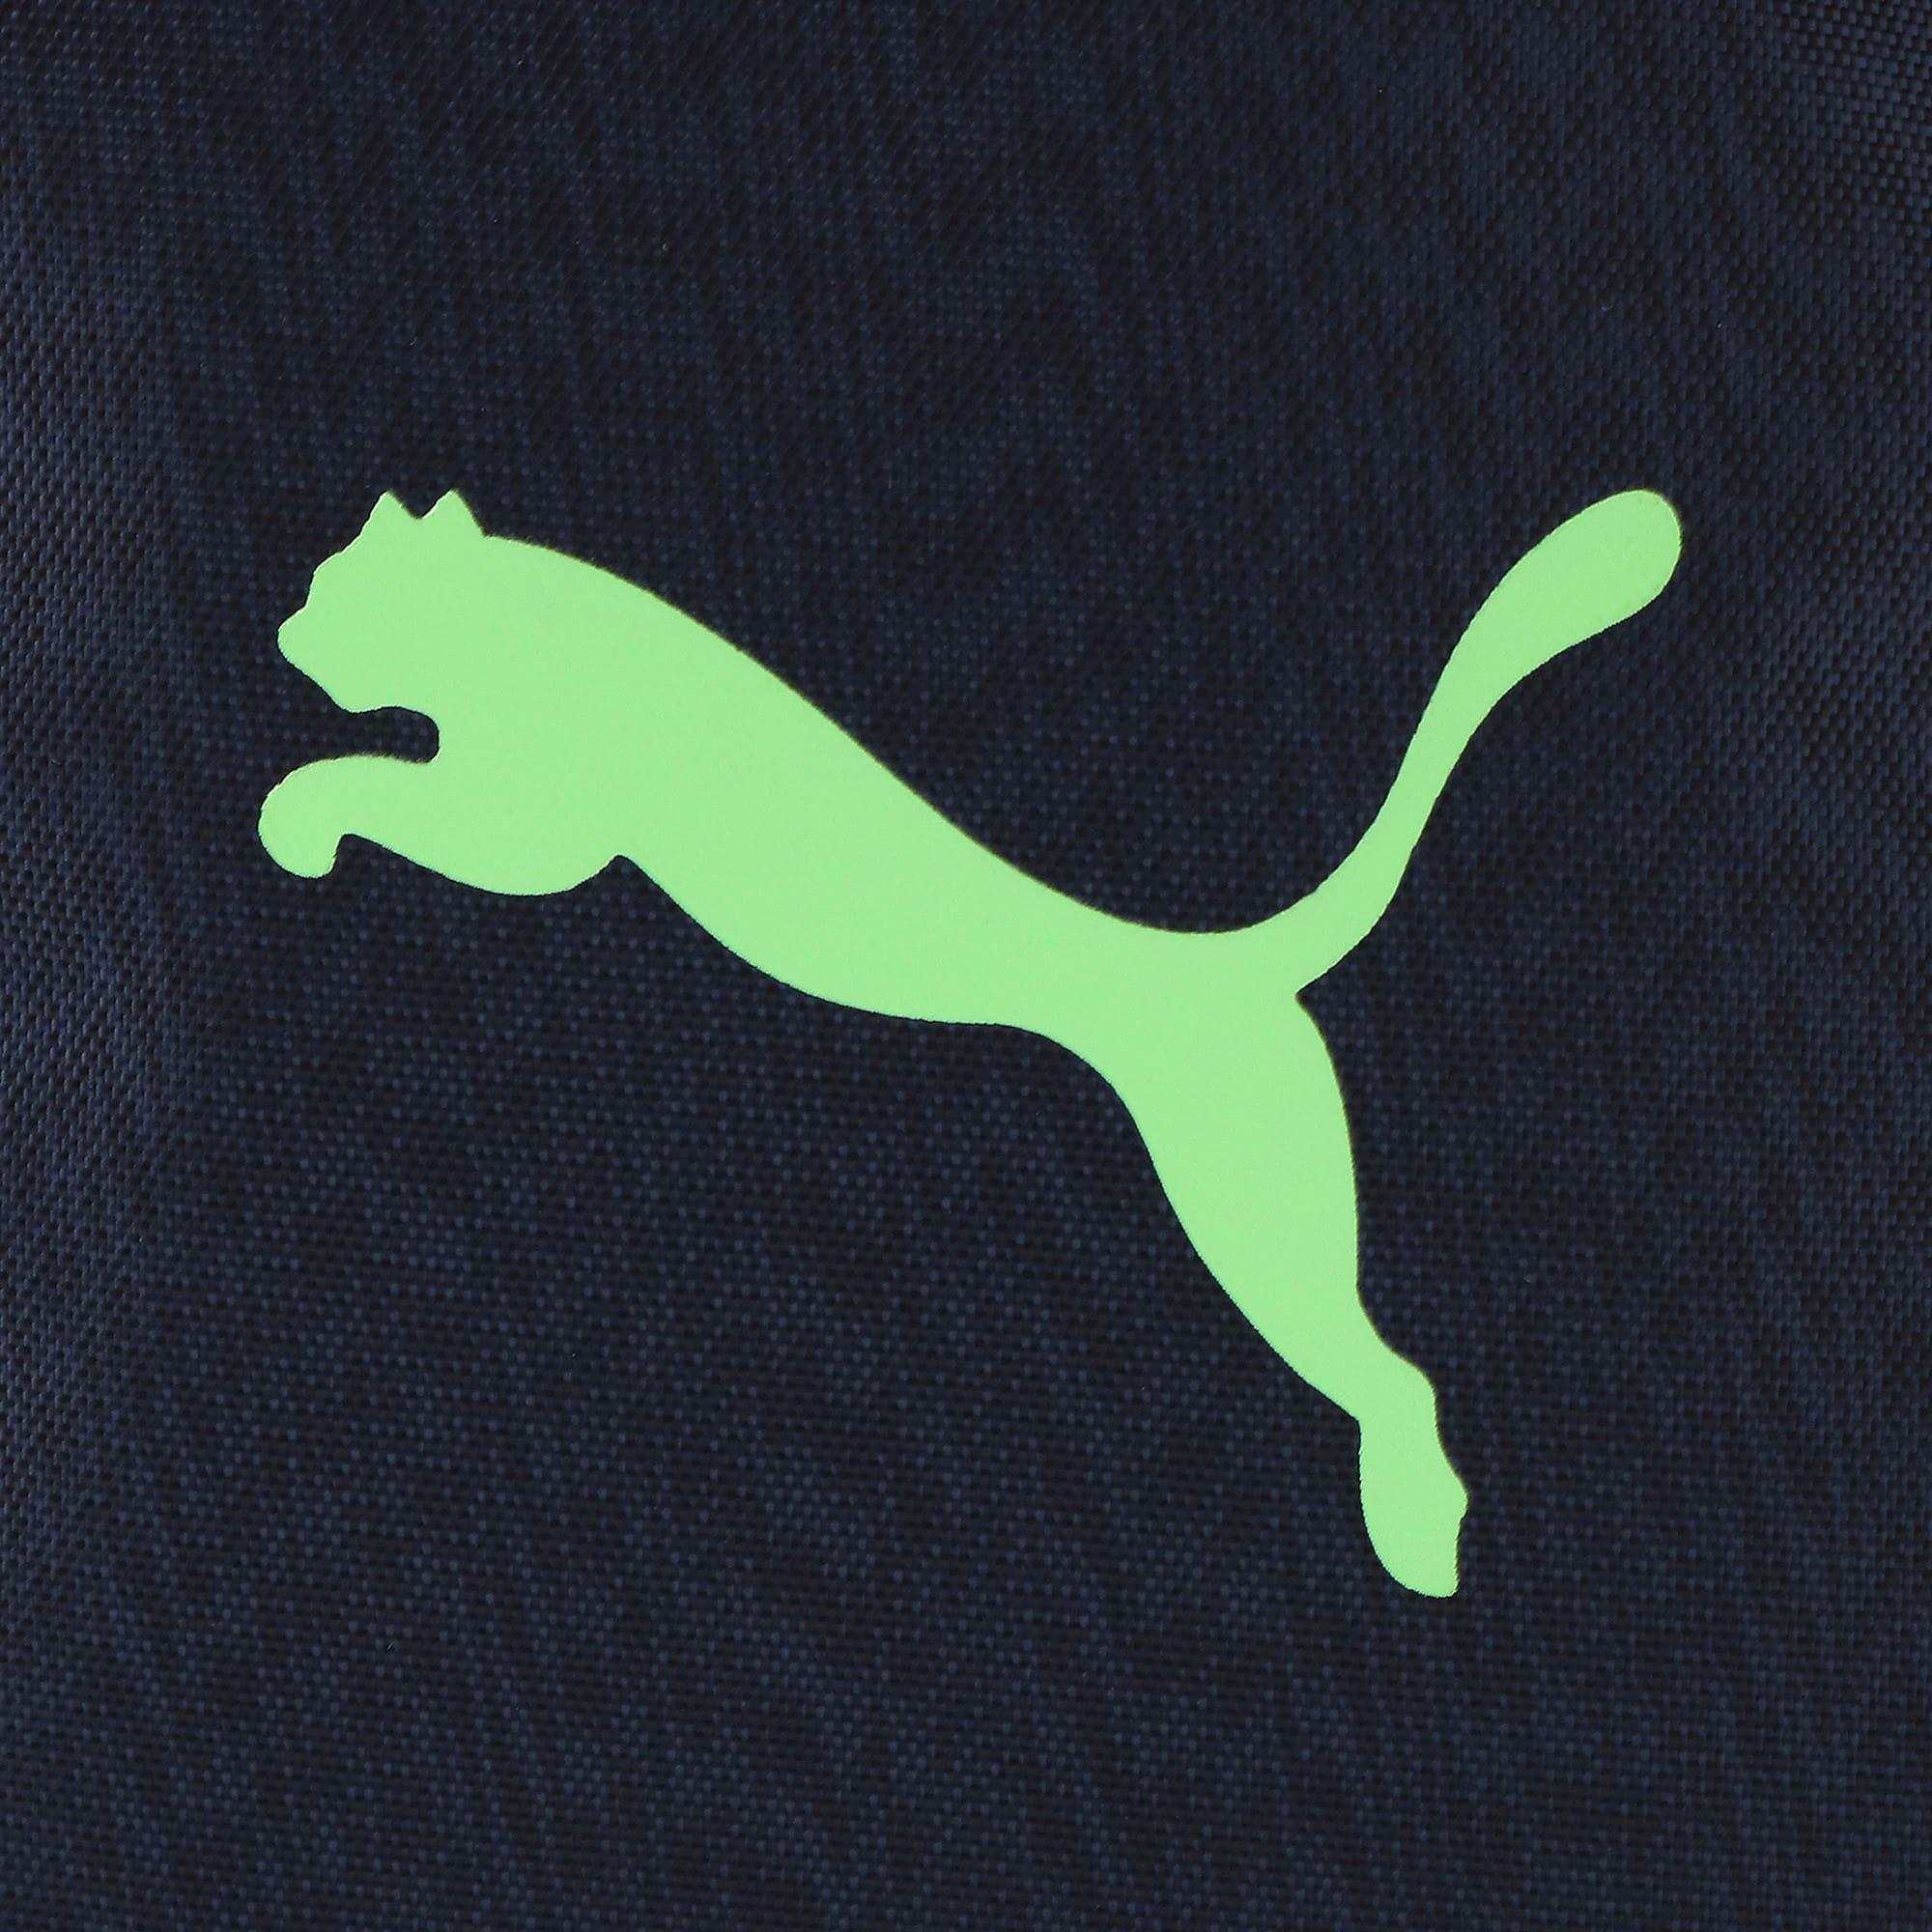 Thumbnail 4 of スタイル クーラー バッグ 10L, Peacoat-Green Gecko, medium-JPN